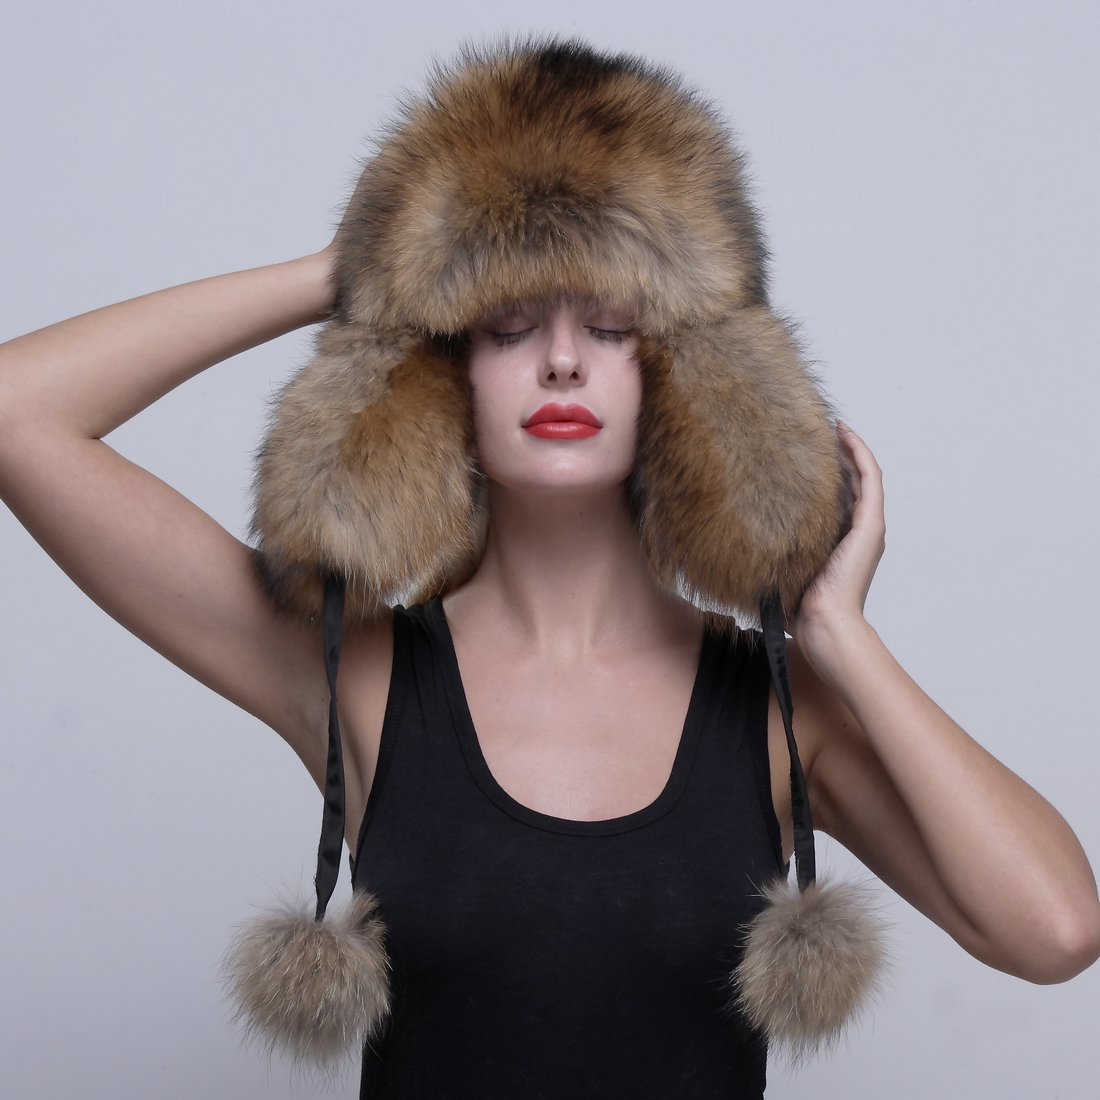 URSFUR Genuine Raccoon Fur Russian Ushanka Trapper Hat Cap with Fur Ball Pompom